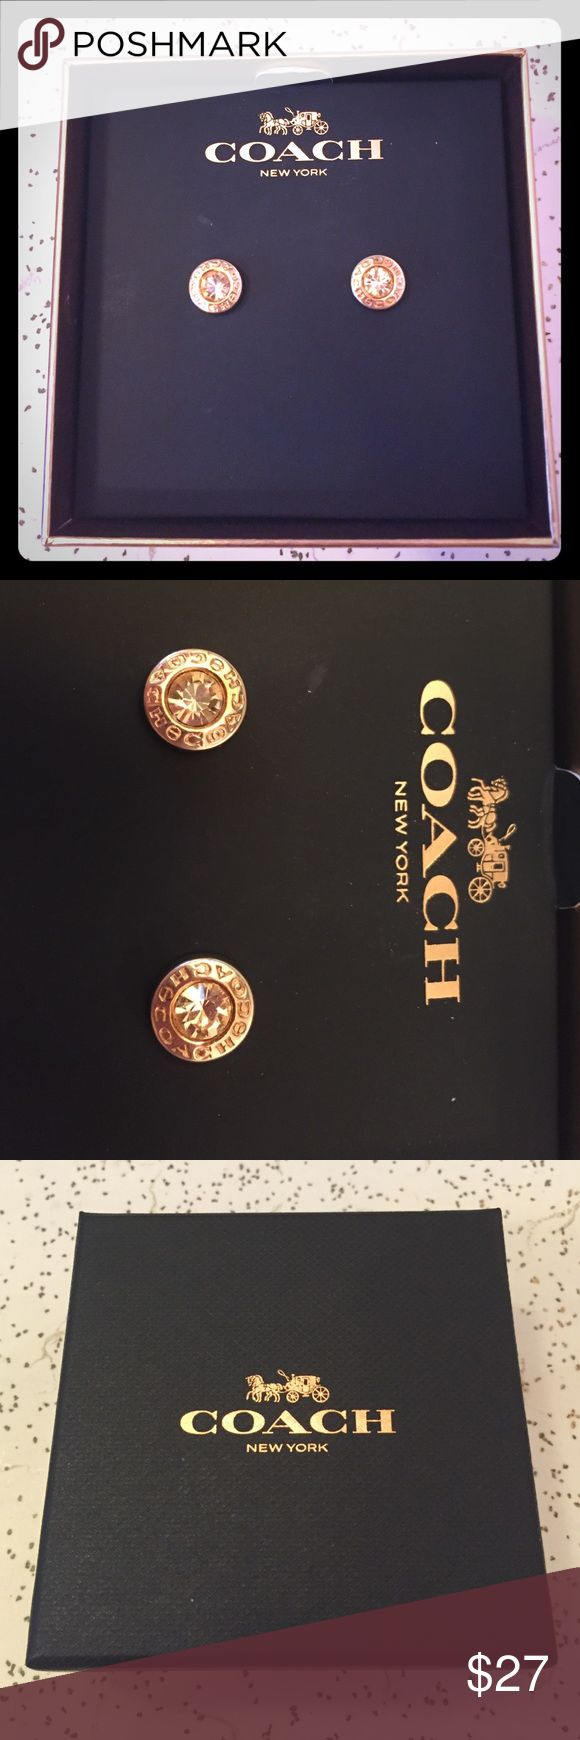 Rose Gold Colored Coach Earrings EUC Coach earrings. Comes with original box. Coach Jewelry Earrings